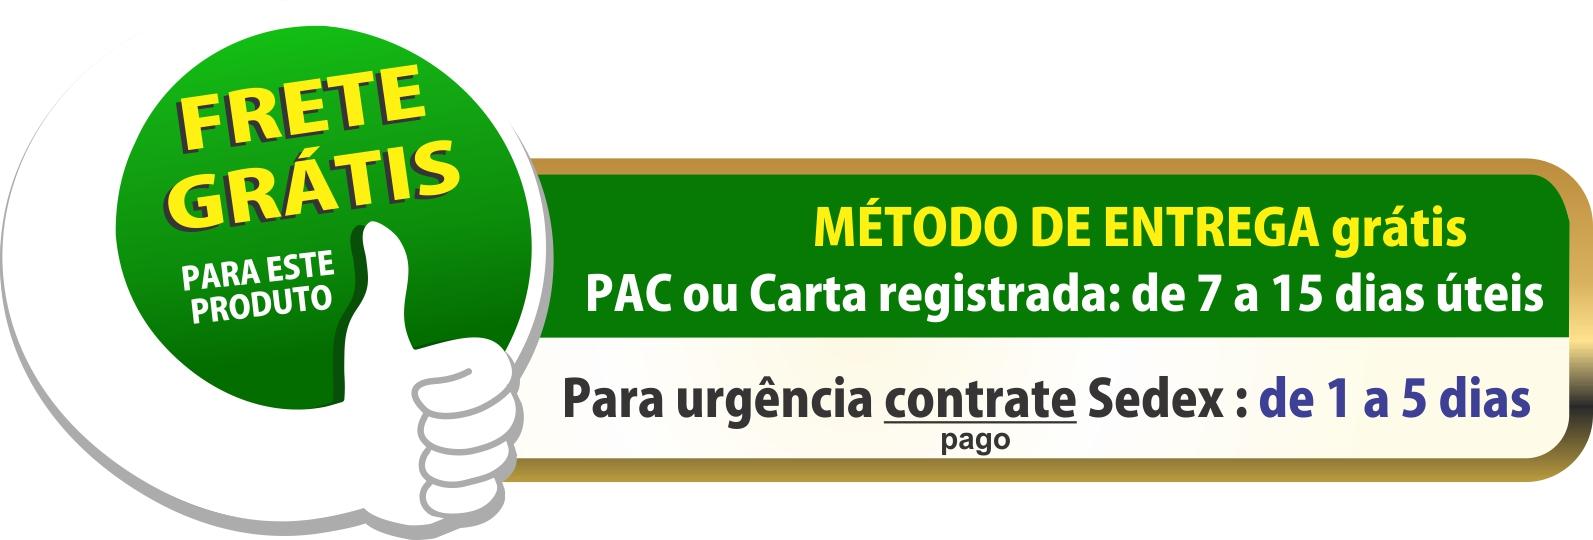 Adesivo Para Geladeira De Kombi ~ Adesivo Deficiente Físico para carro FAC Signs Impress u00e3o Digital